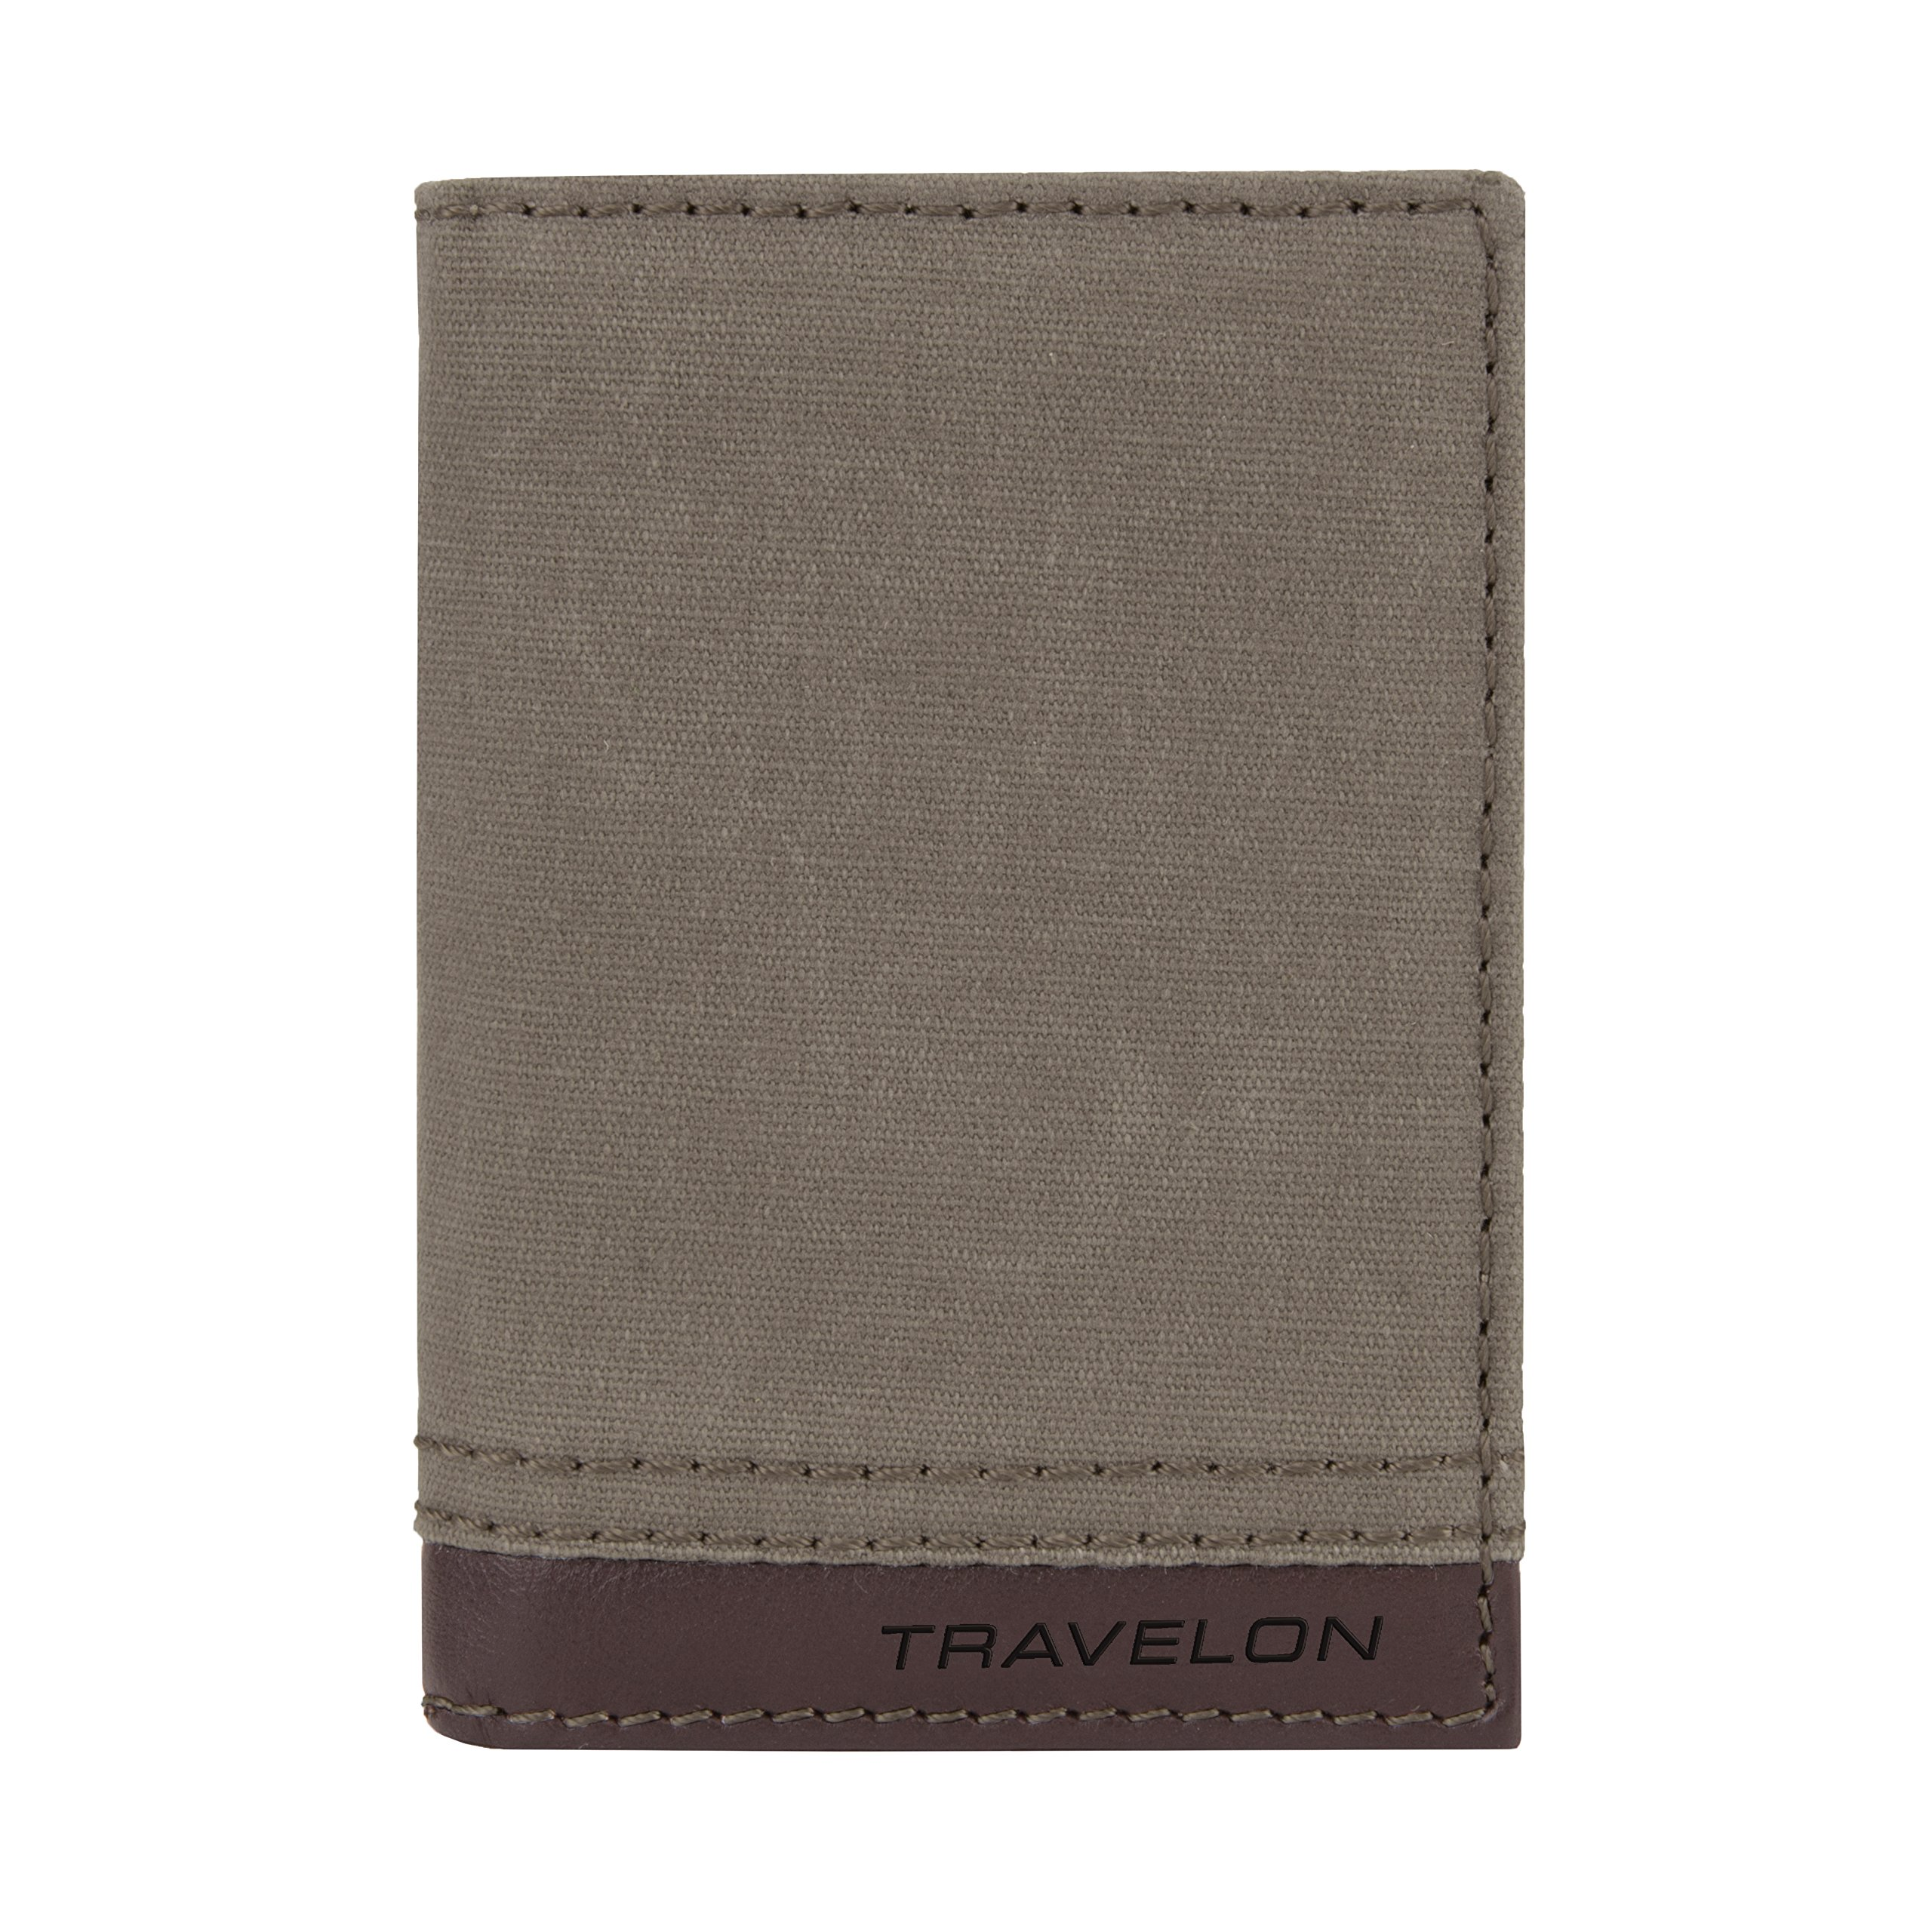 Travelon Rfid Blocking Courier Slim Wallet, Stone Gray